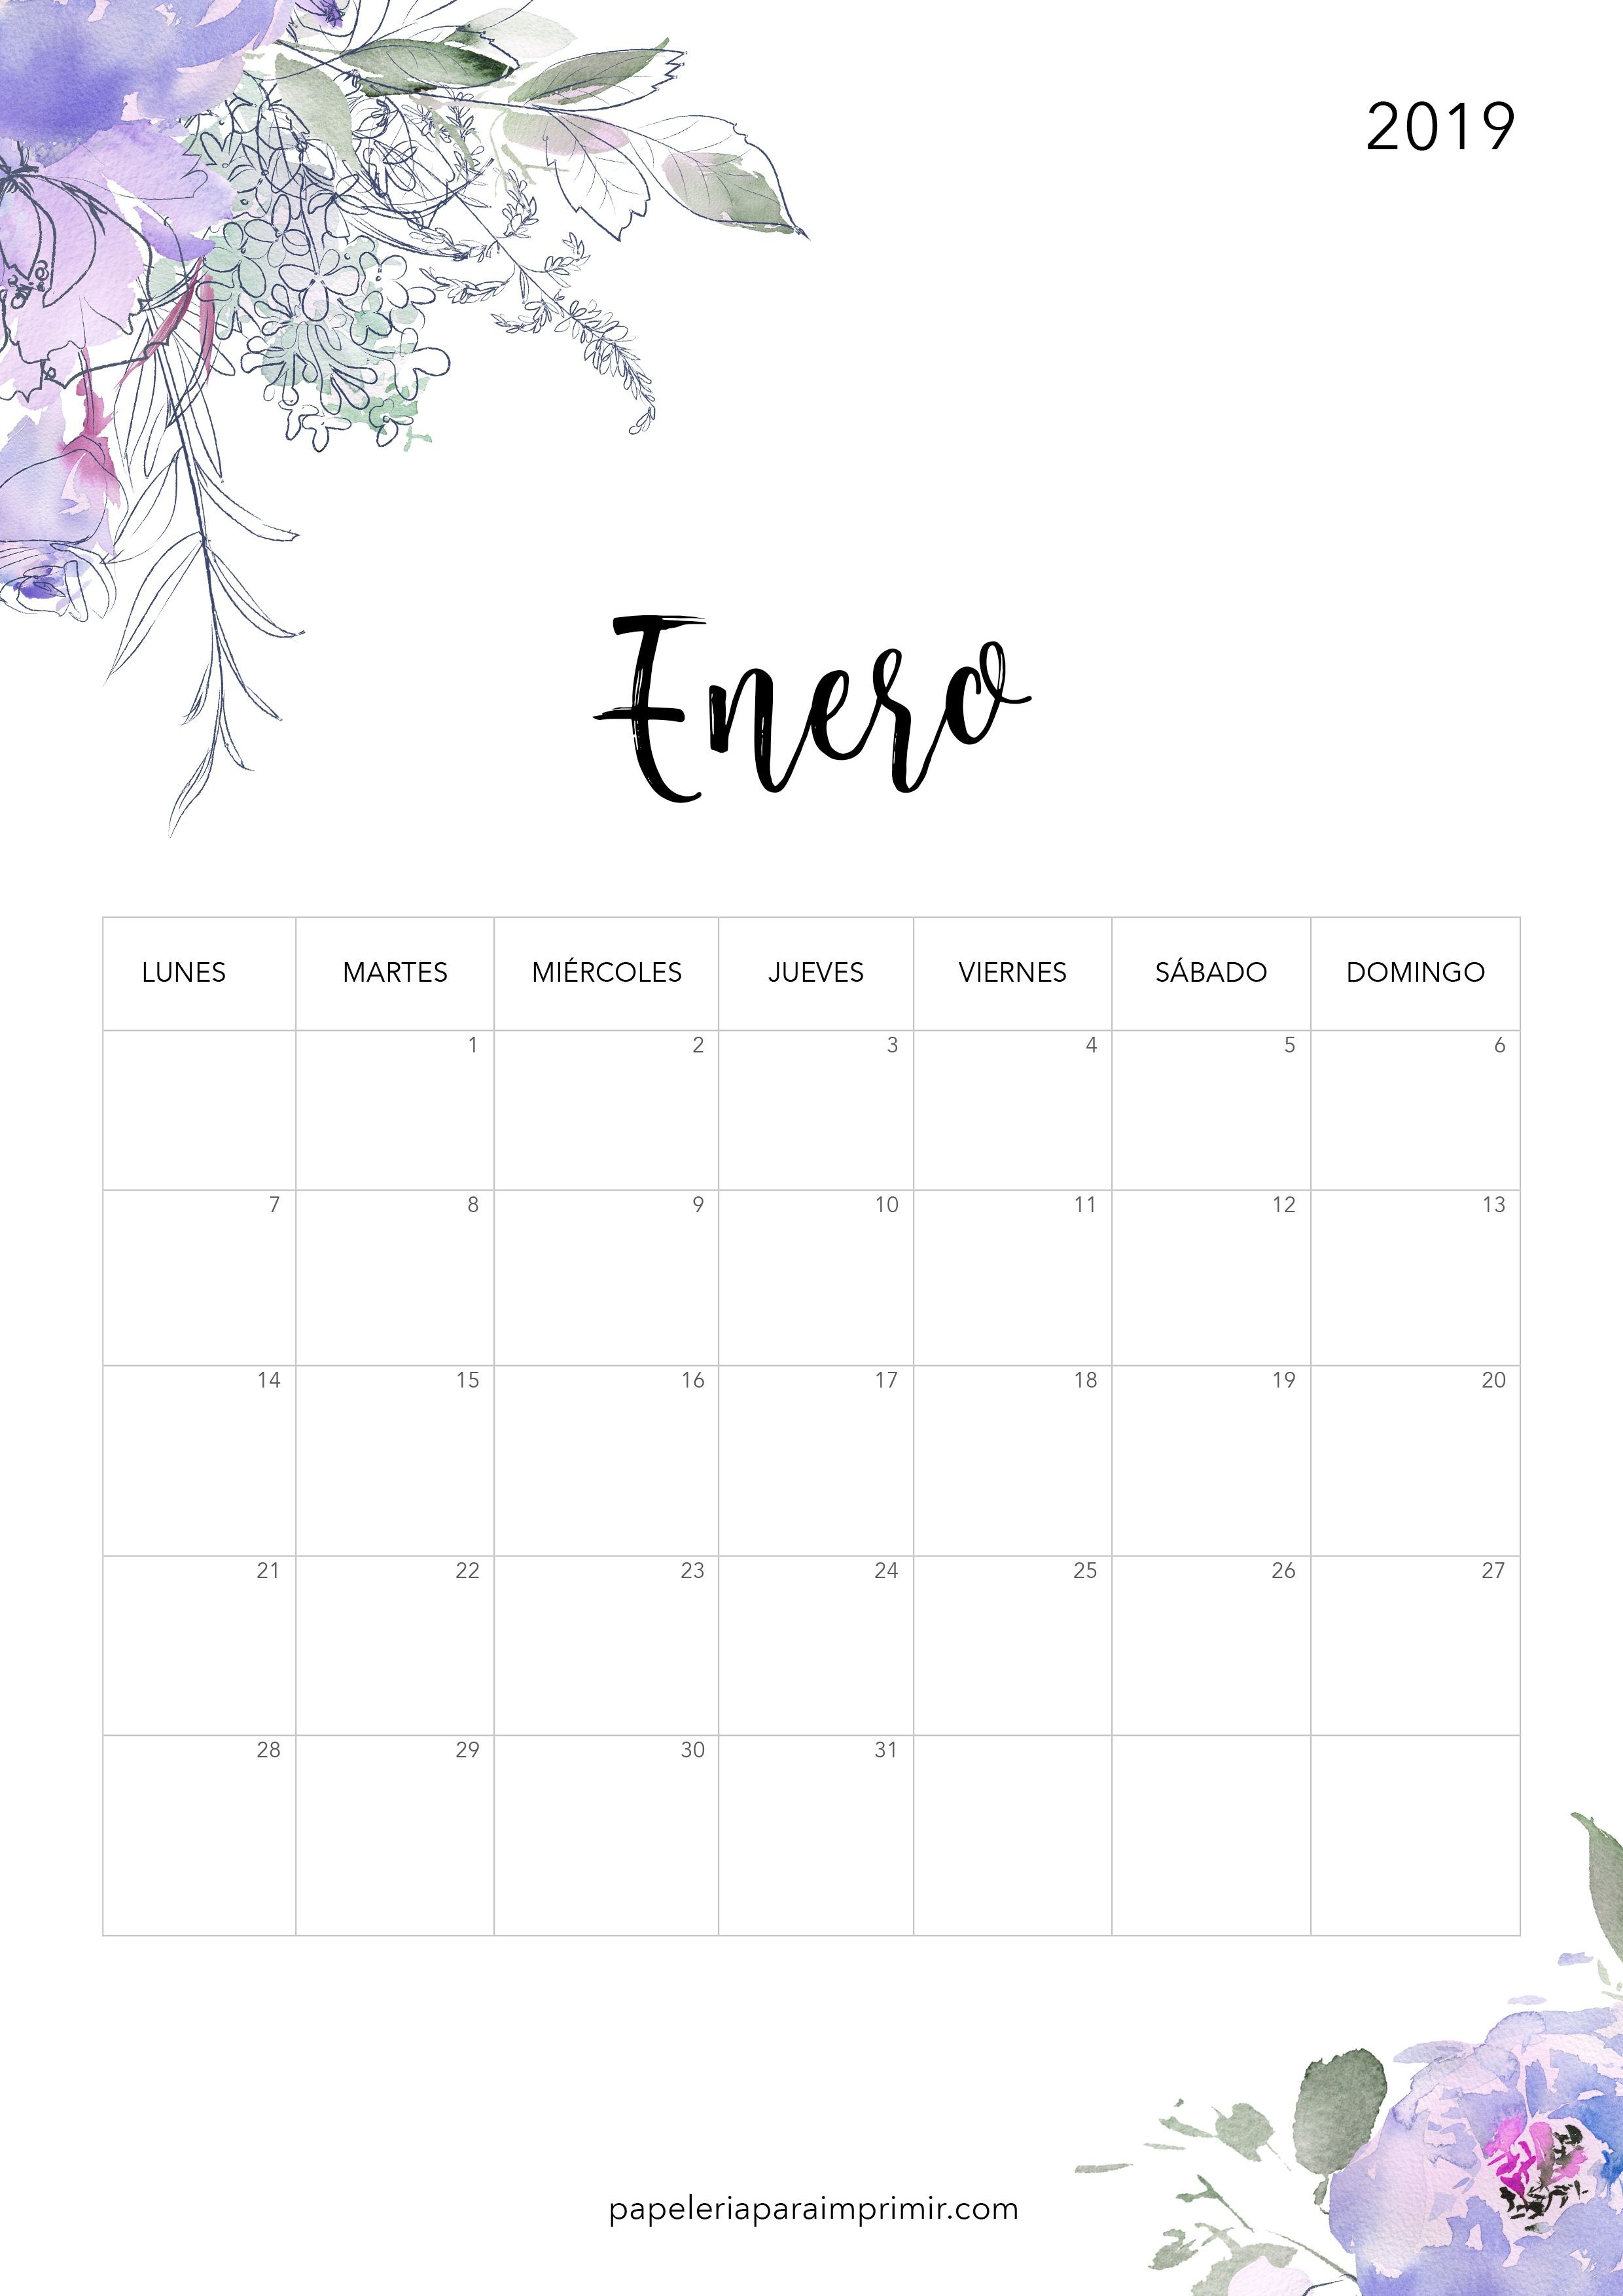 Calendario para imprimir 2019 Enero calendario imprimir enero